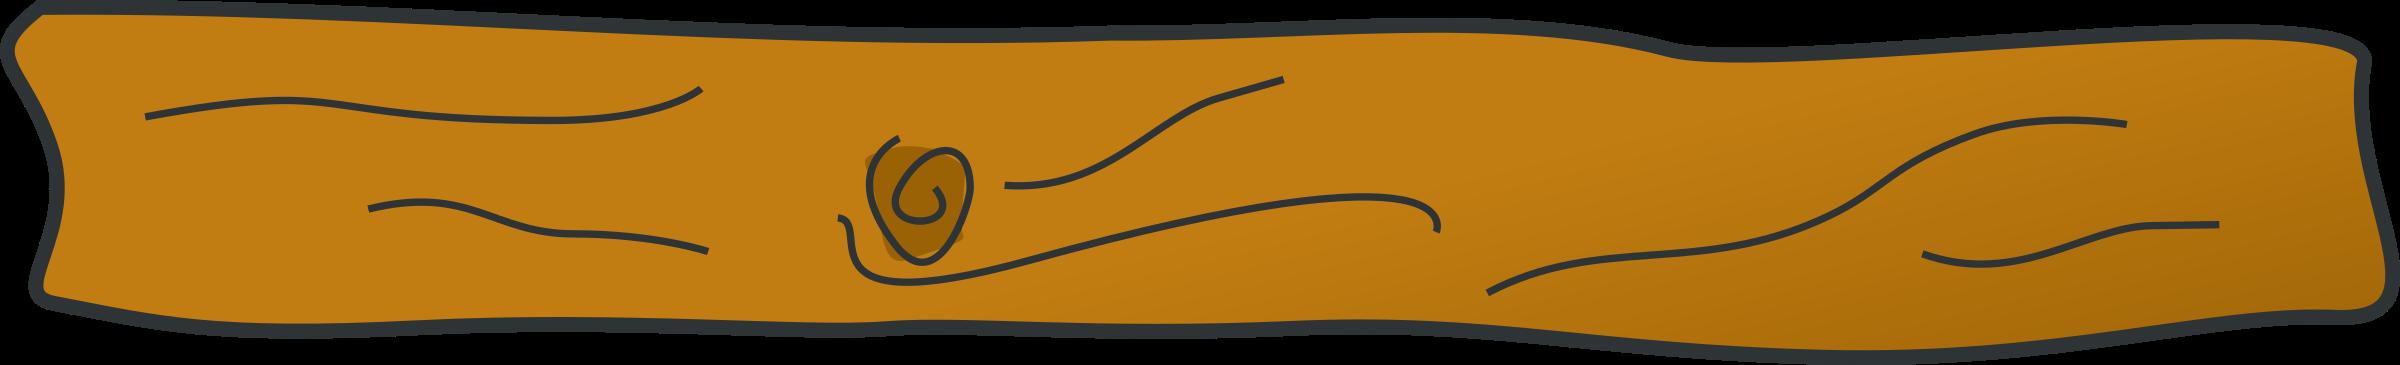 Wooden Plank Cartoon : Wood Plank